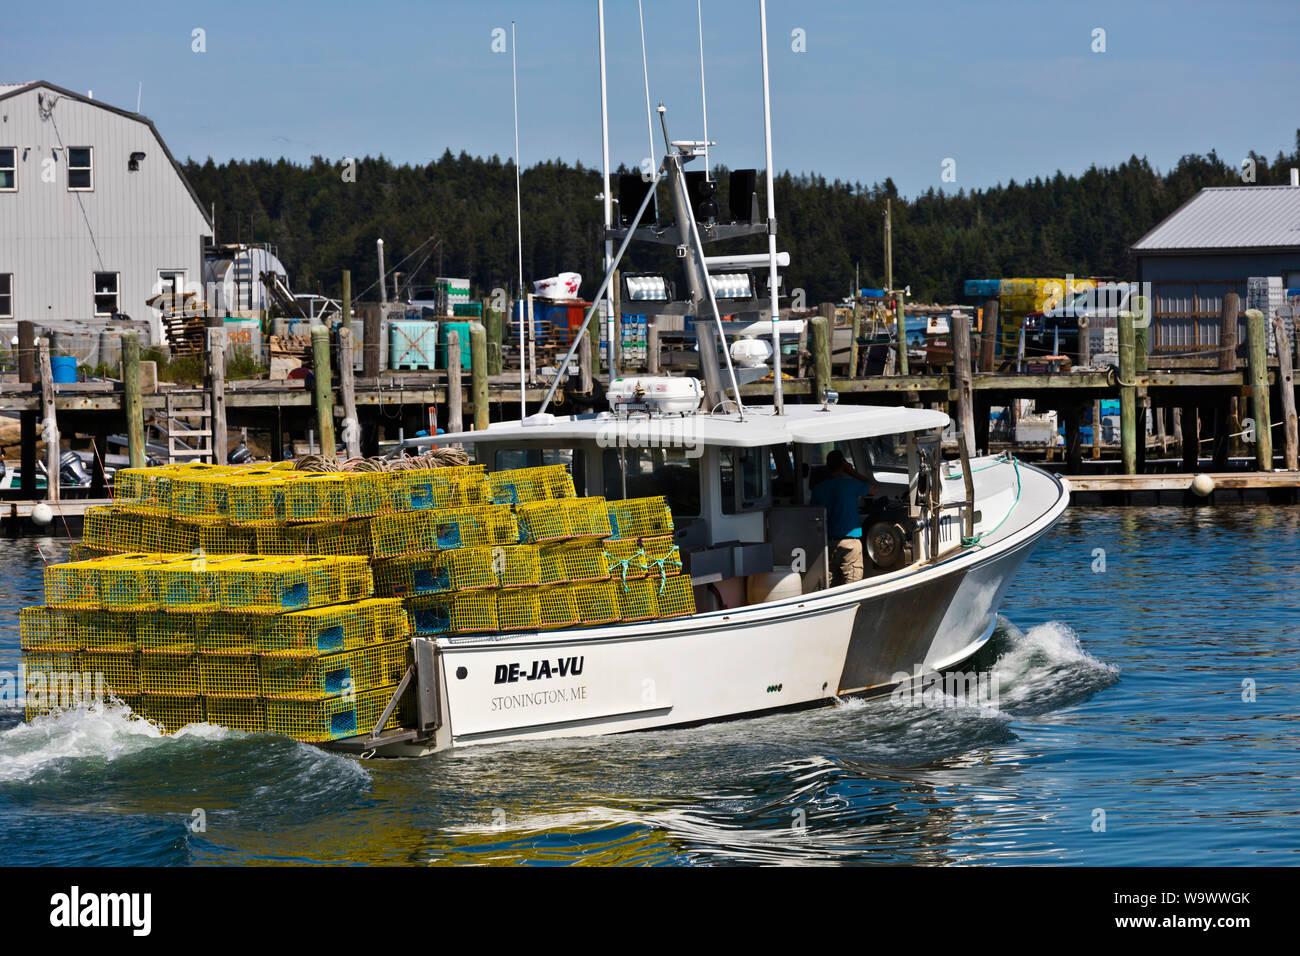 Un barco de pesca de langosta jefes de Stonington un importante destino turístico - Deer Island, Maine Foto de stock